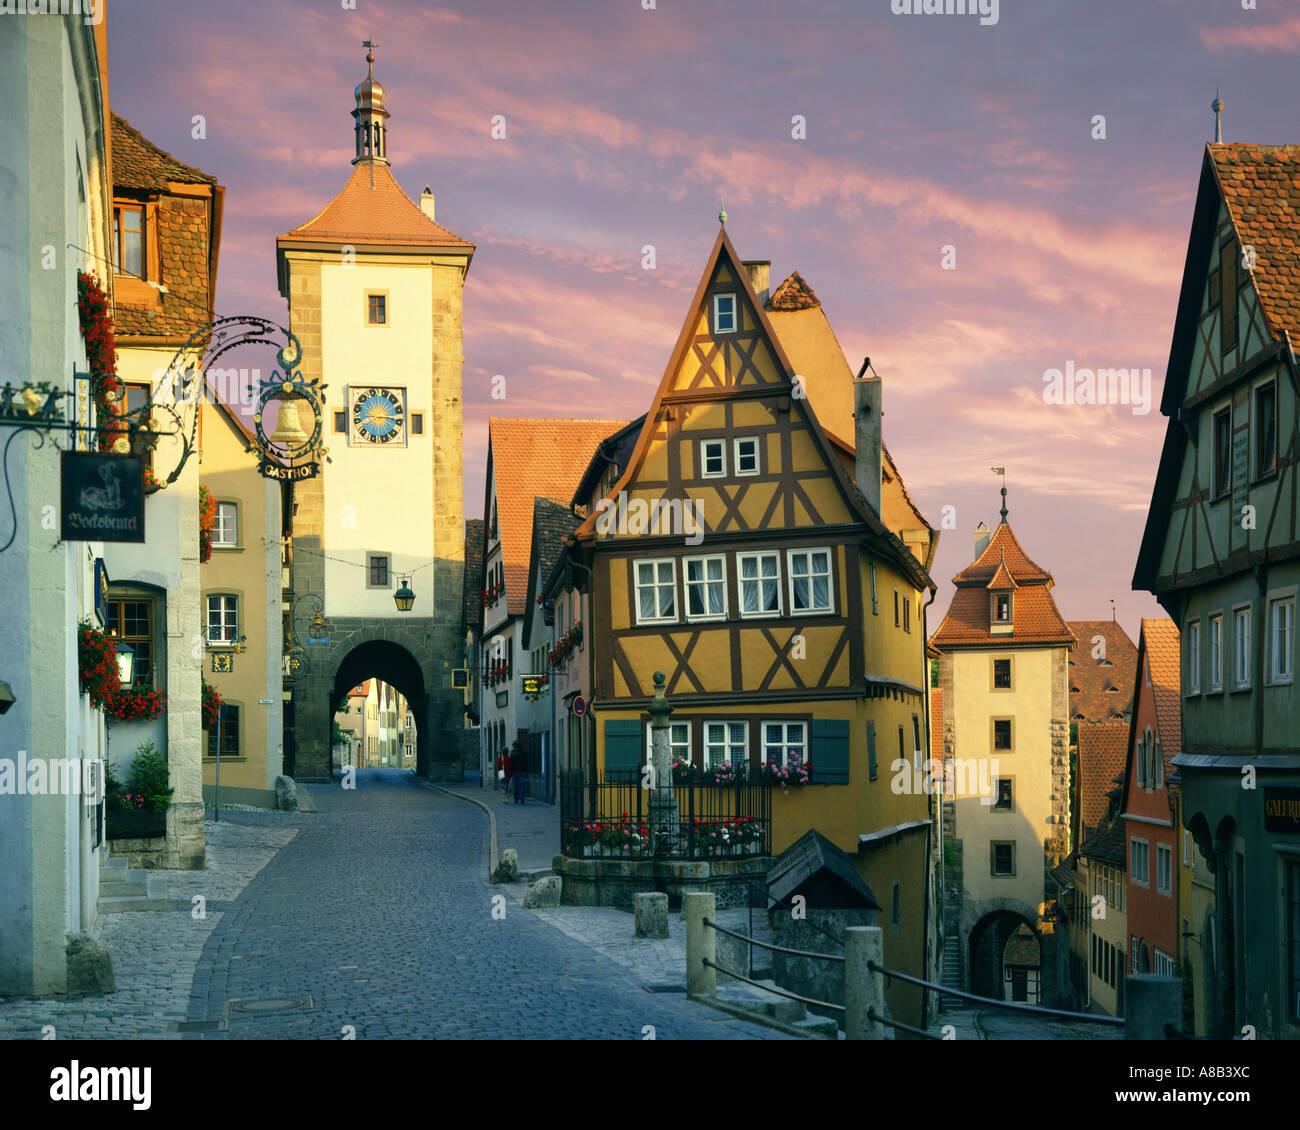 DE - Bayern: Ploenlein in Rothenburg Ob der Tauber Stockbild